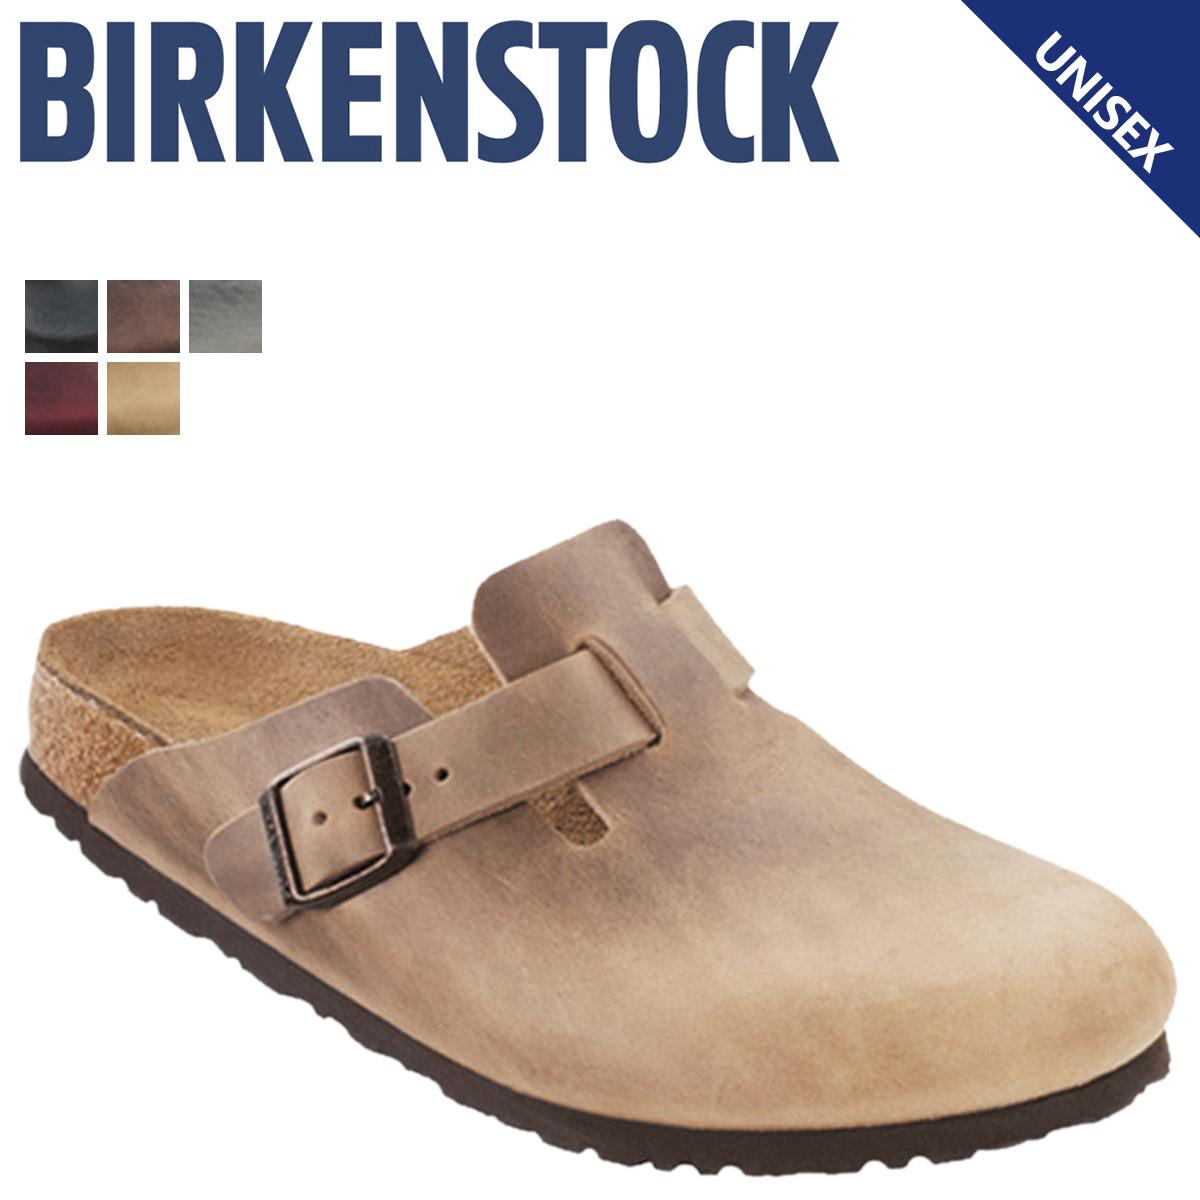 BIRKENSTOCK ボストン メンズ レディース ビルケンシュトック BOSTON ビルケン サンダル 細幅 普通幅 [9/19 追加入荷]